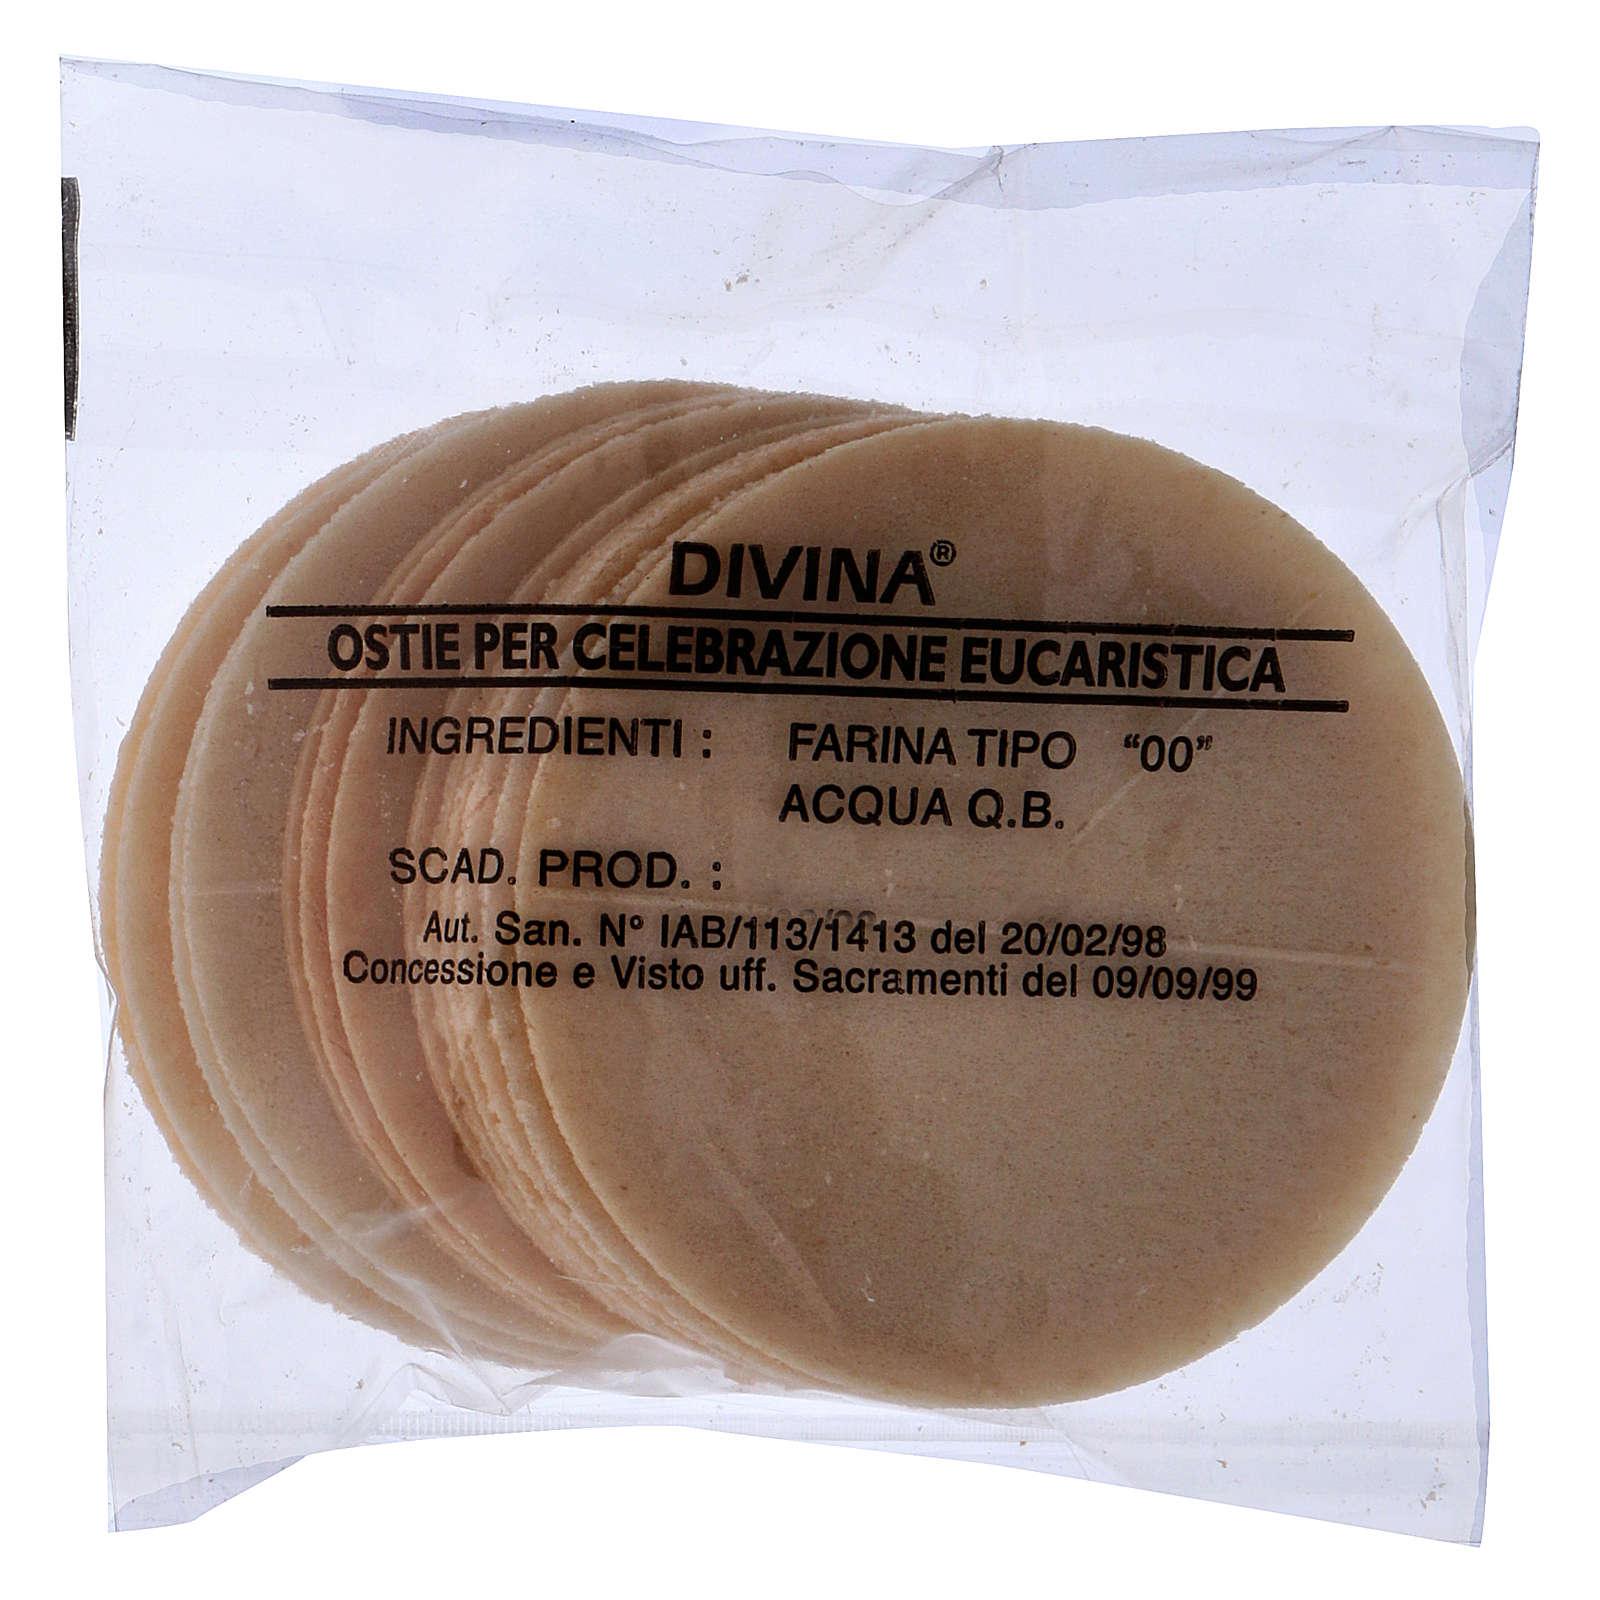 Thick altar bread 7.5 cm diameter 15 pcs bag 3